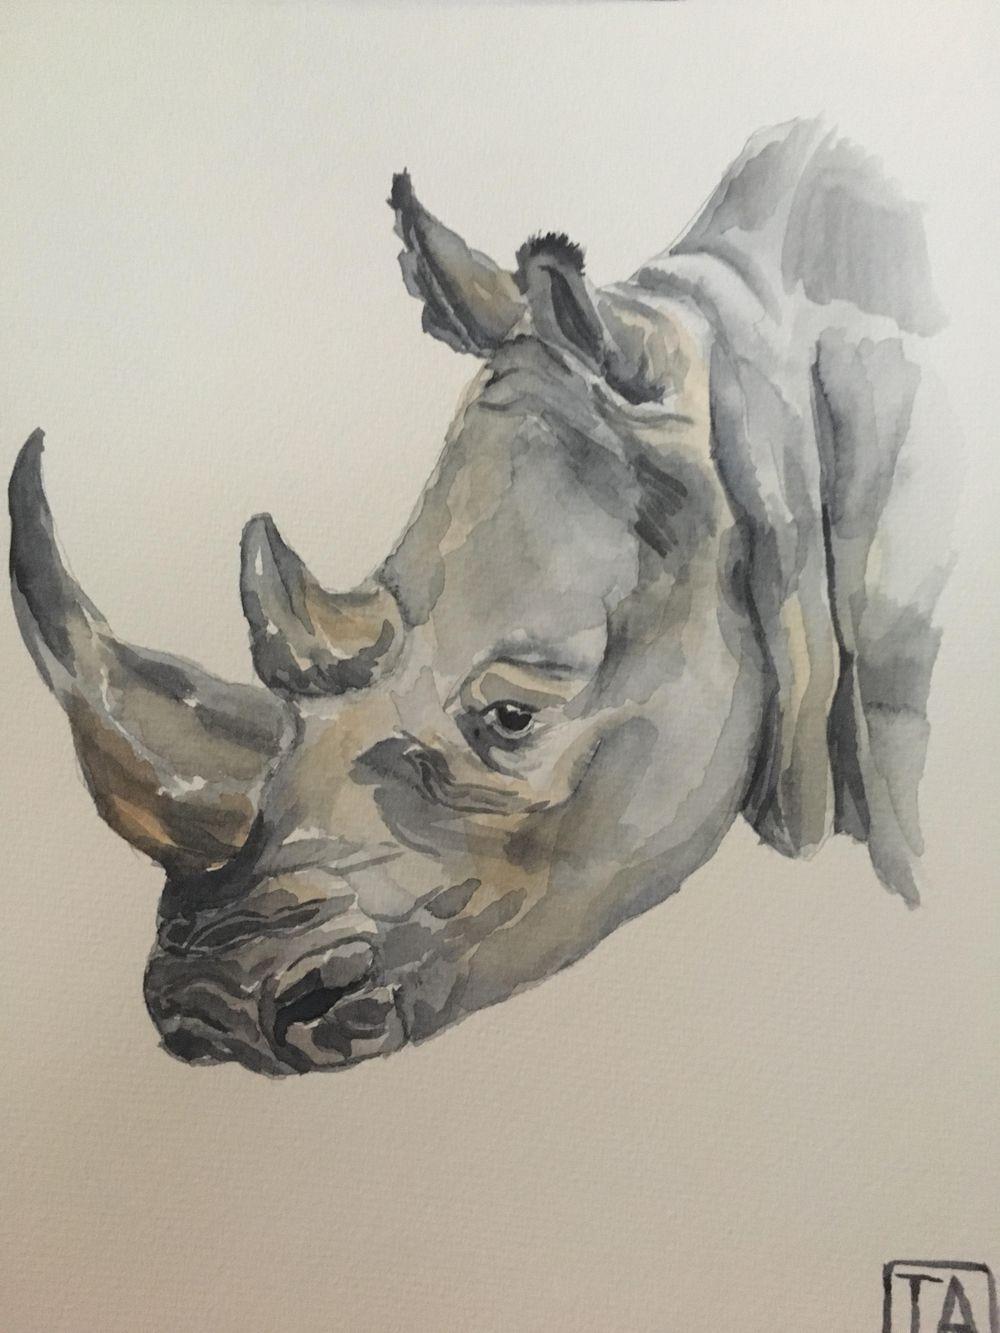 Rhinocerous - image 1 - student project